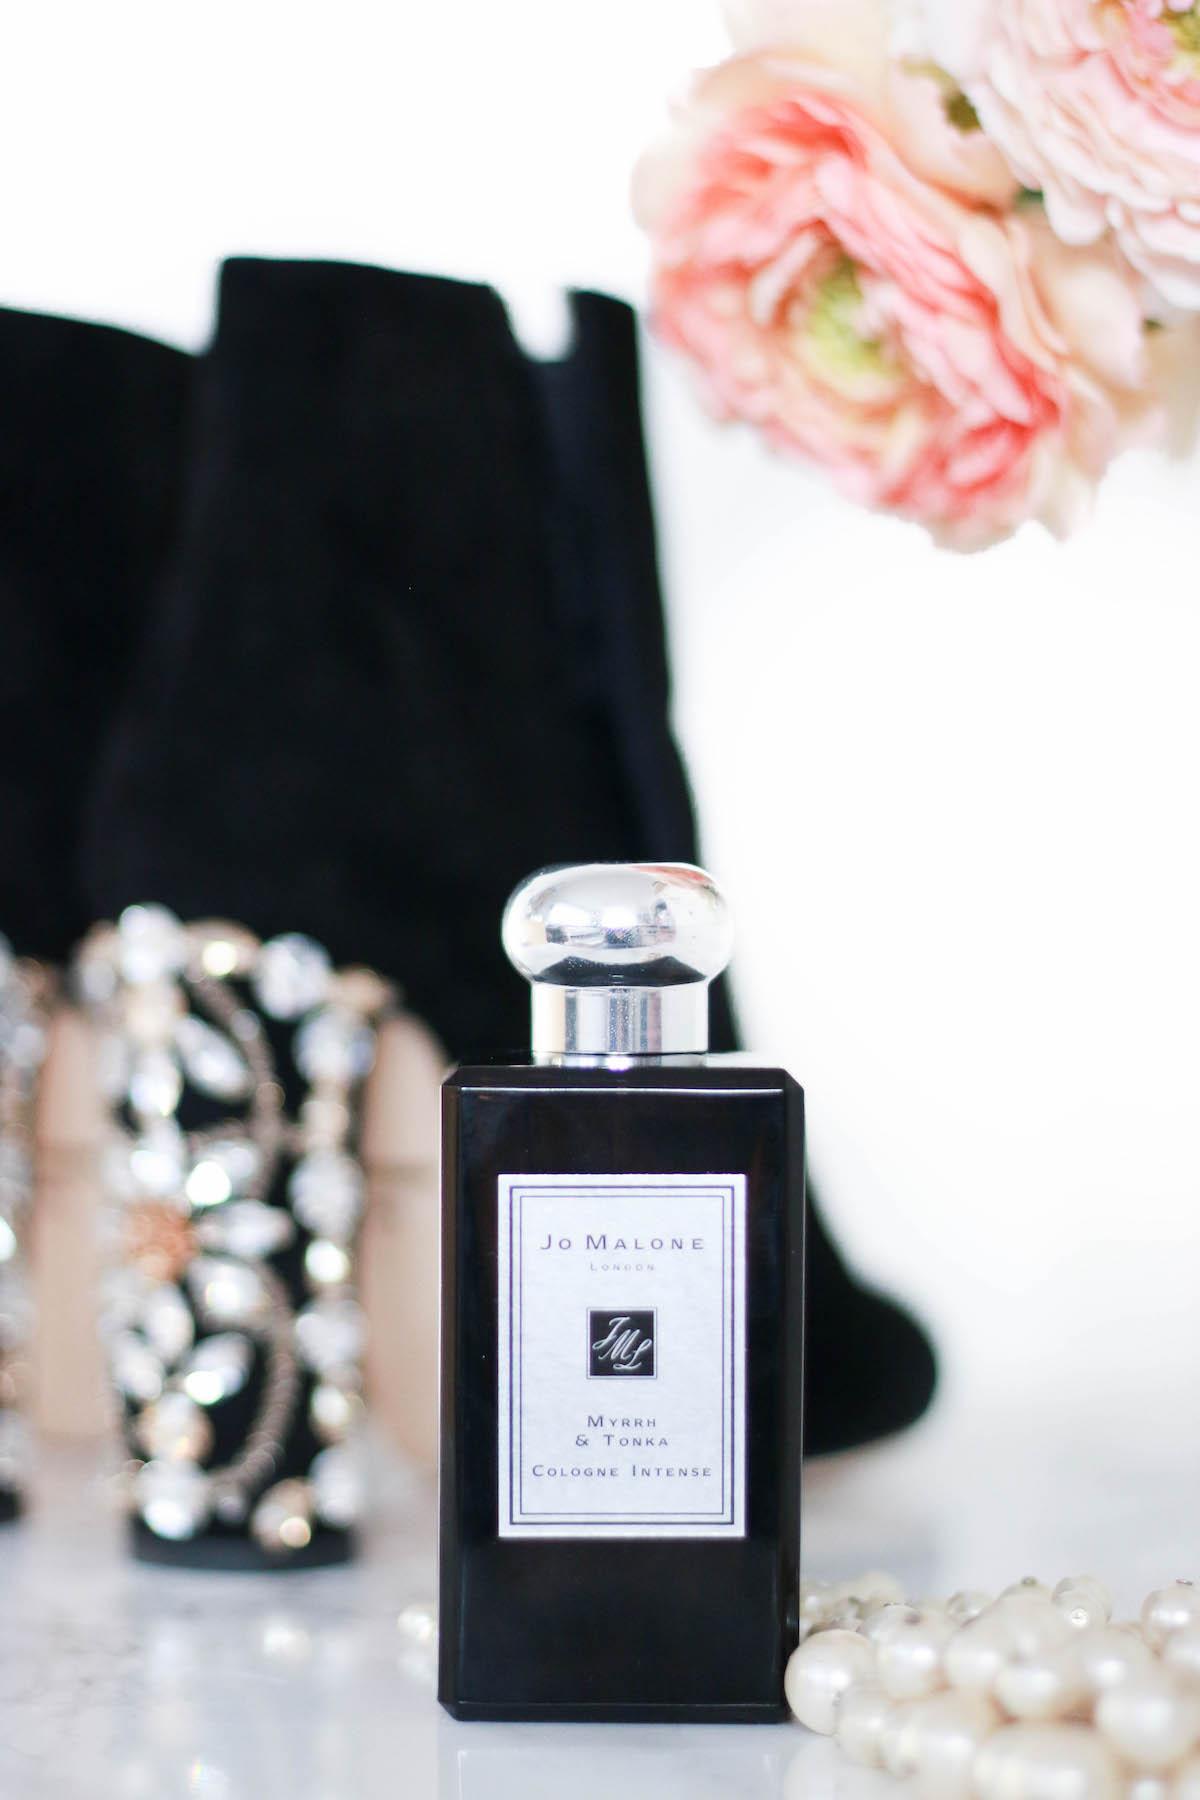 Jo Malone Myrrh & Tonka Parfum | Cologne Intense